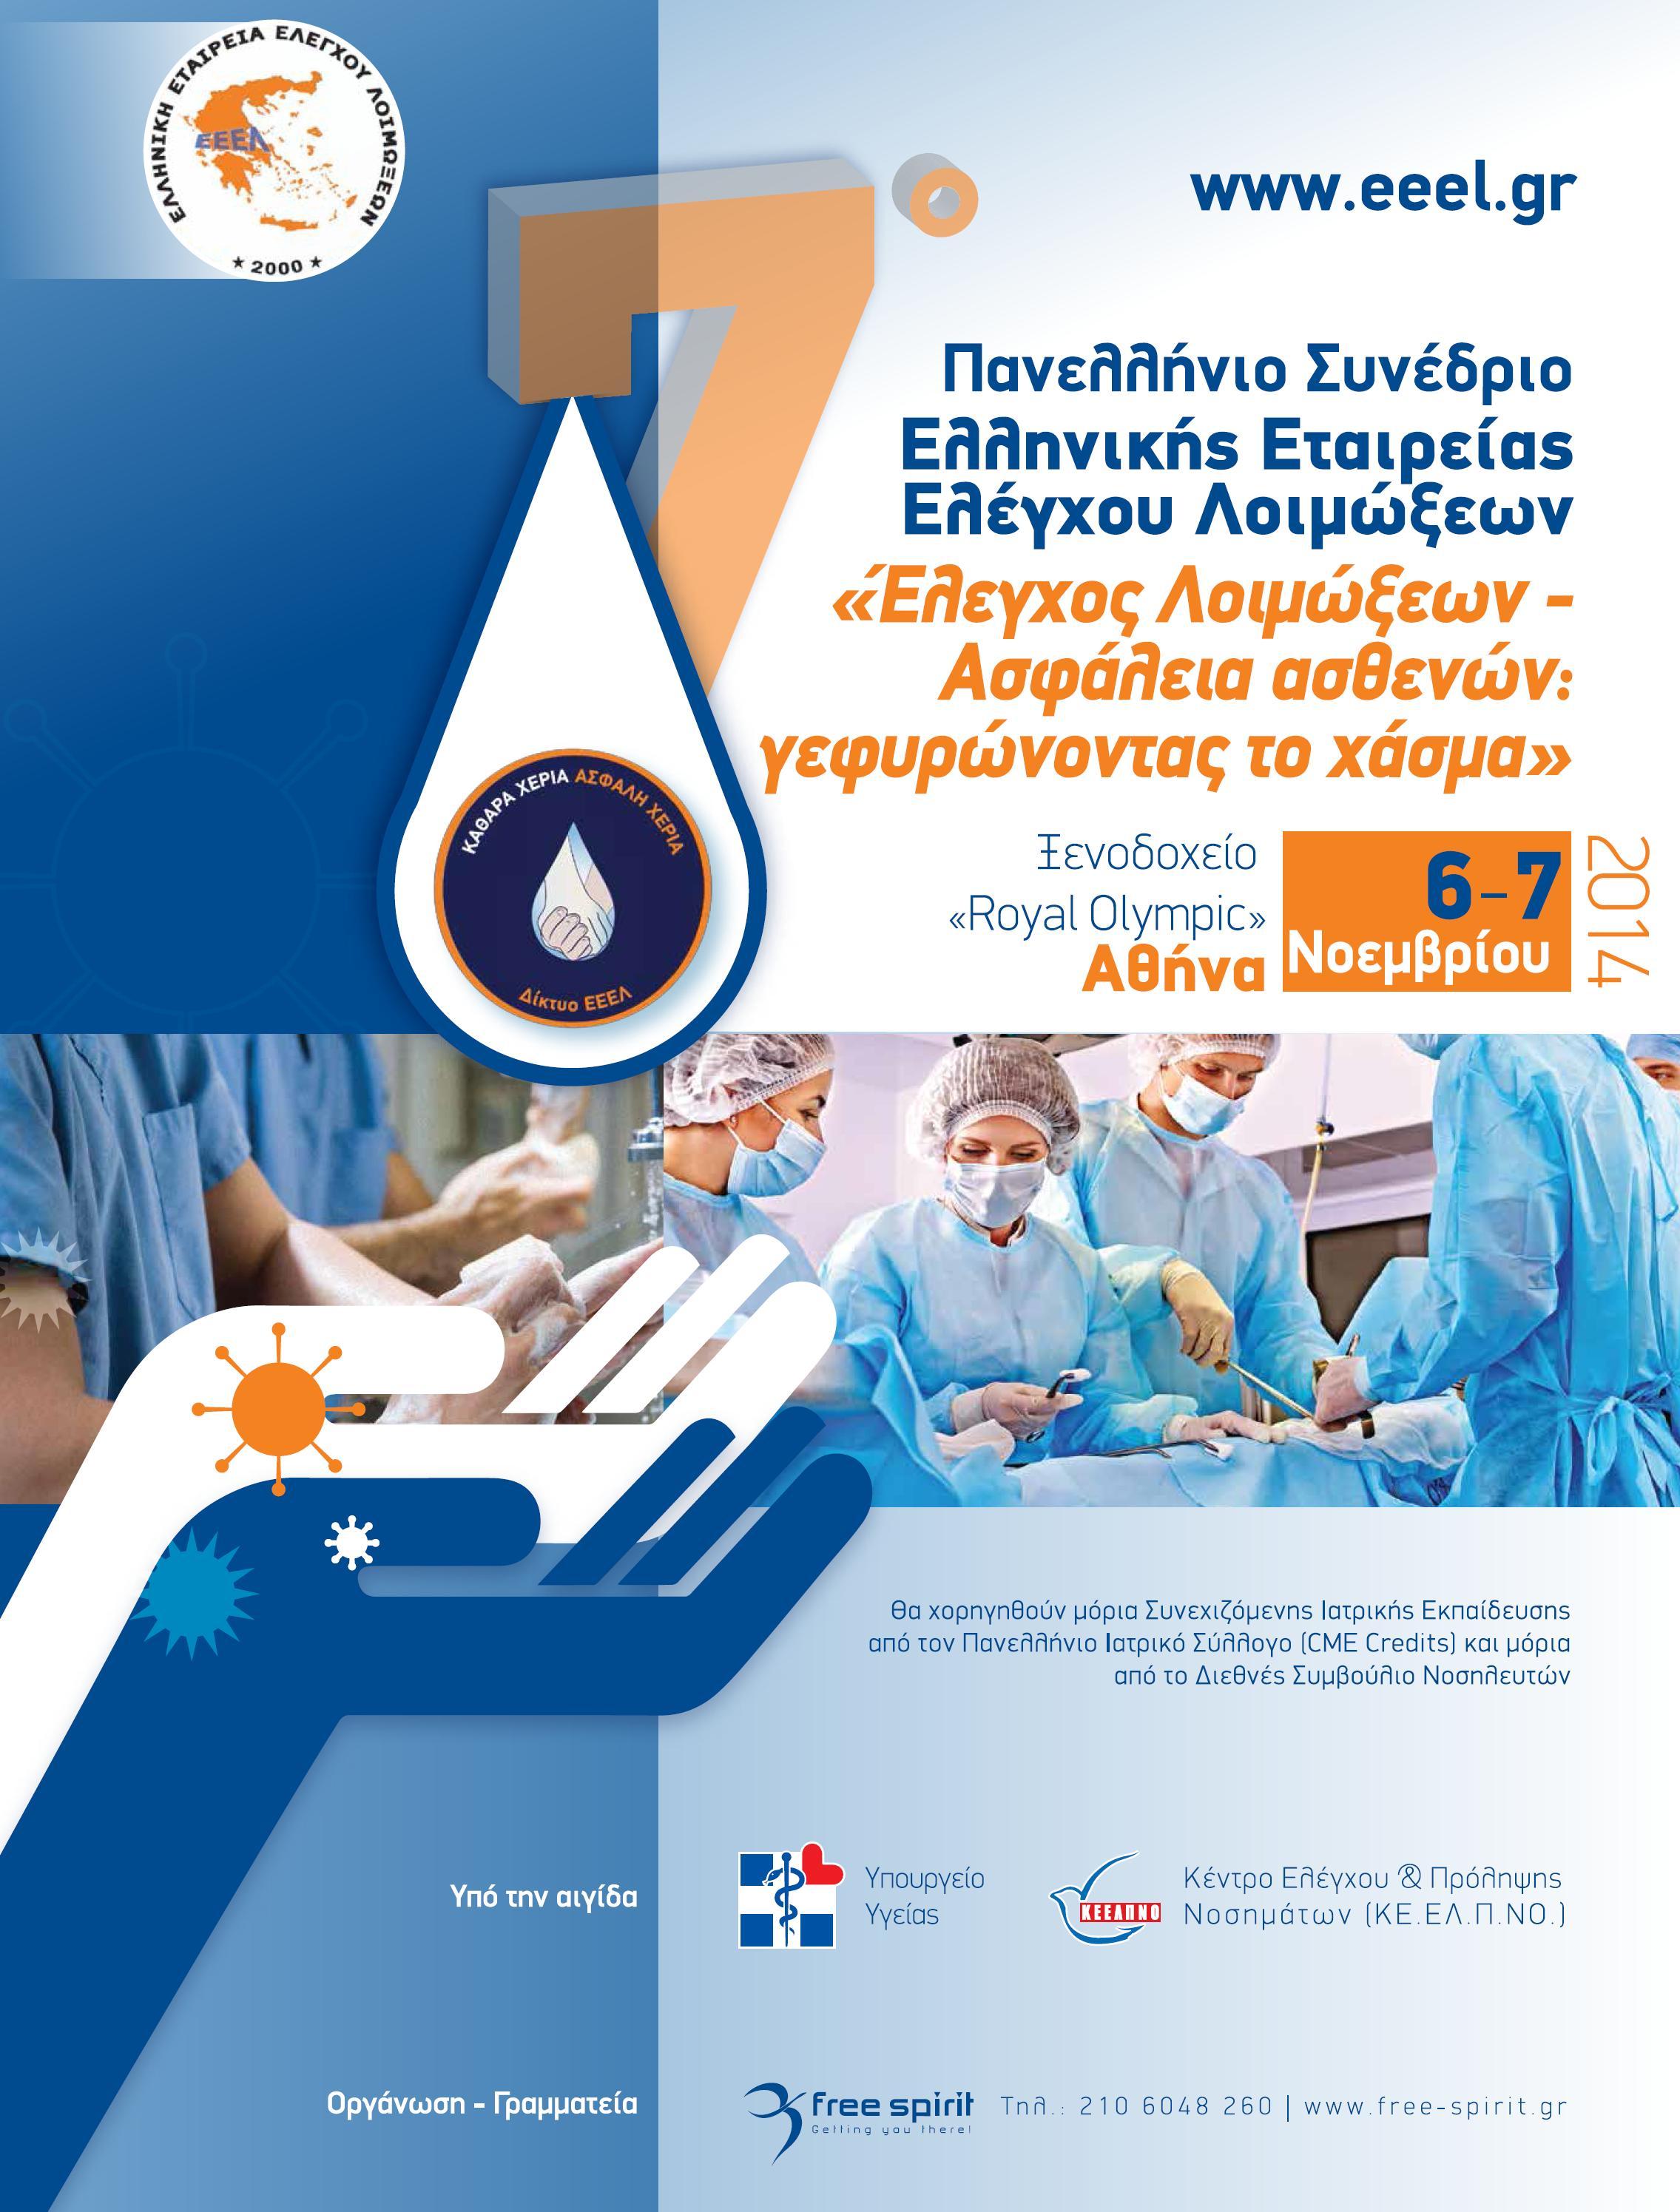 7o Πανελλήνιο Συνέδριο Ελληνικής Εταιρείας Ελέγχου Λοιμώξεων